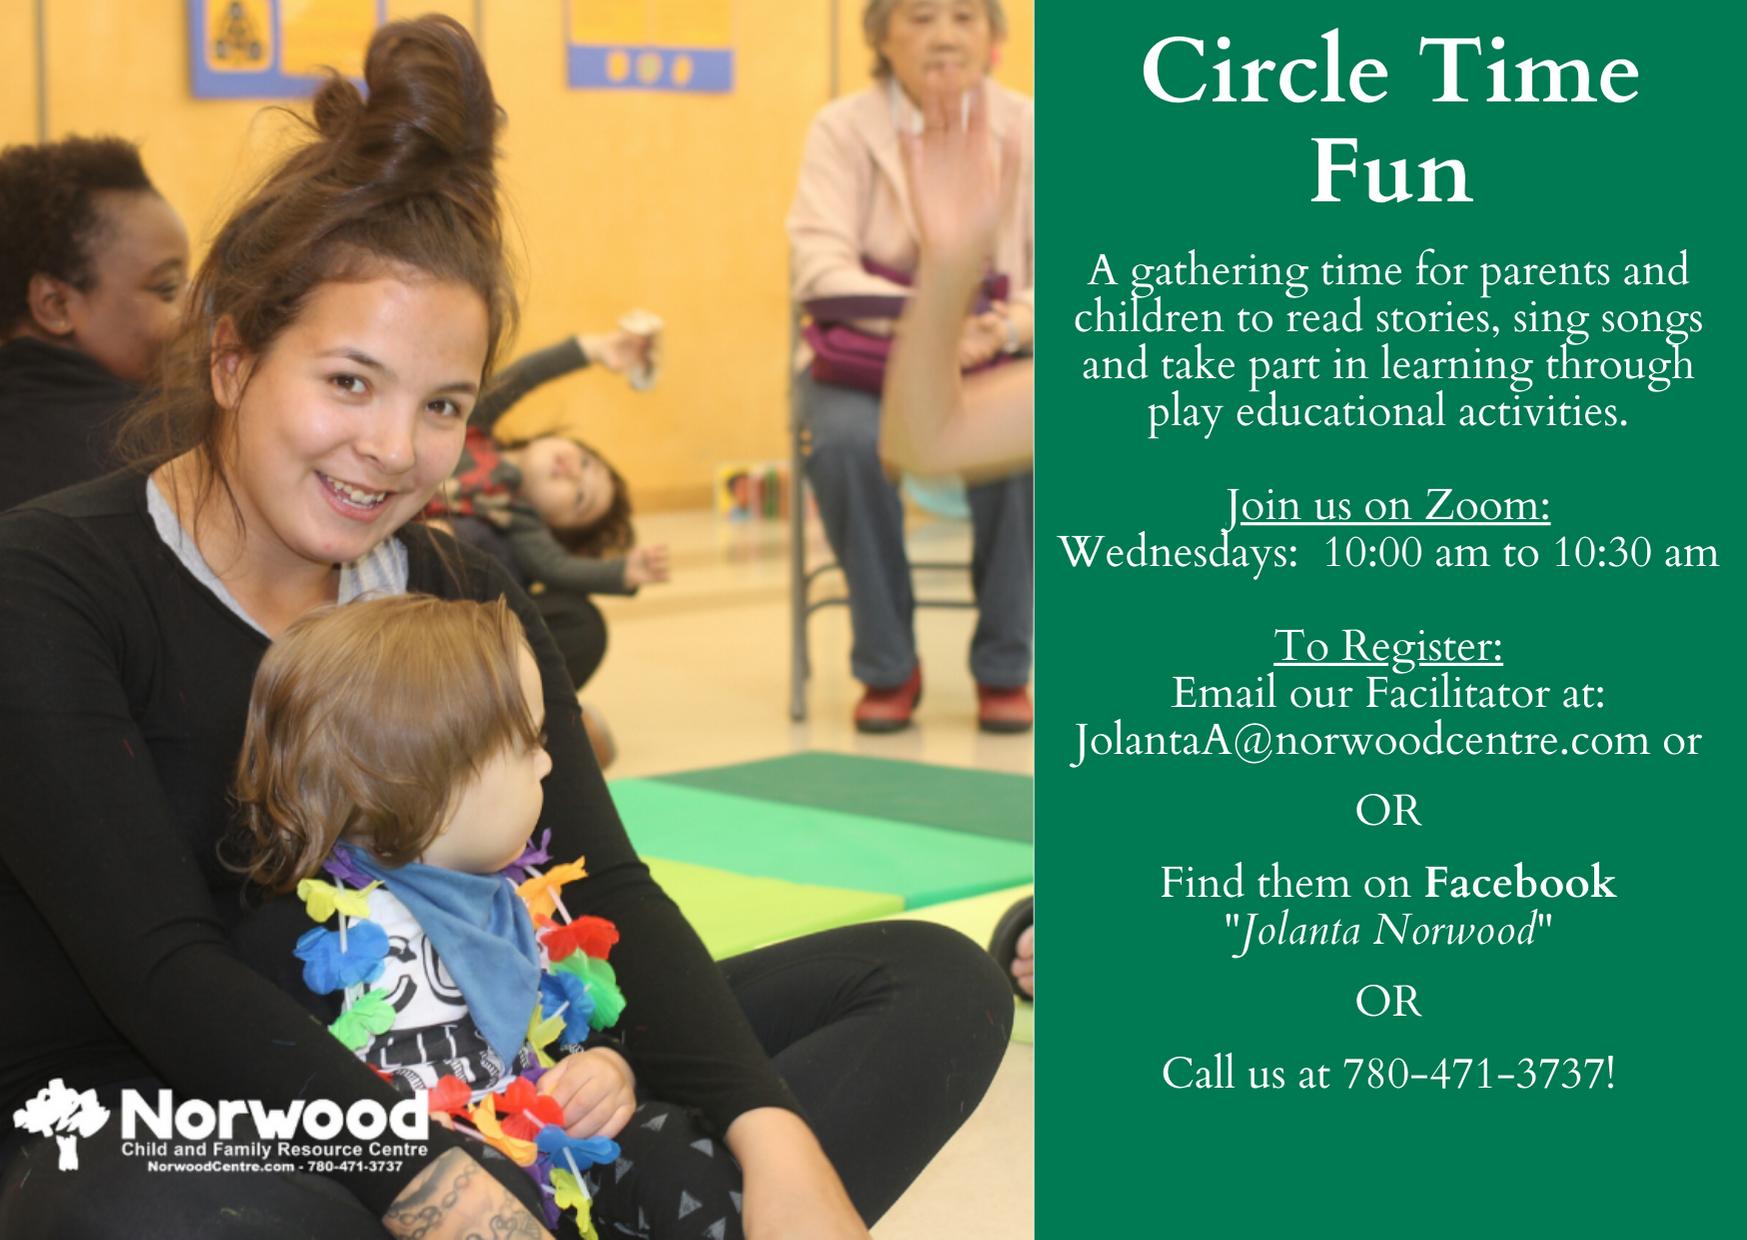 Circle Time Fun Central